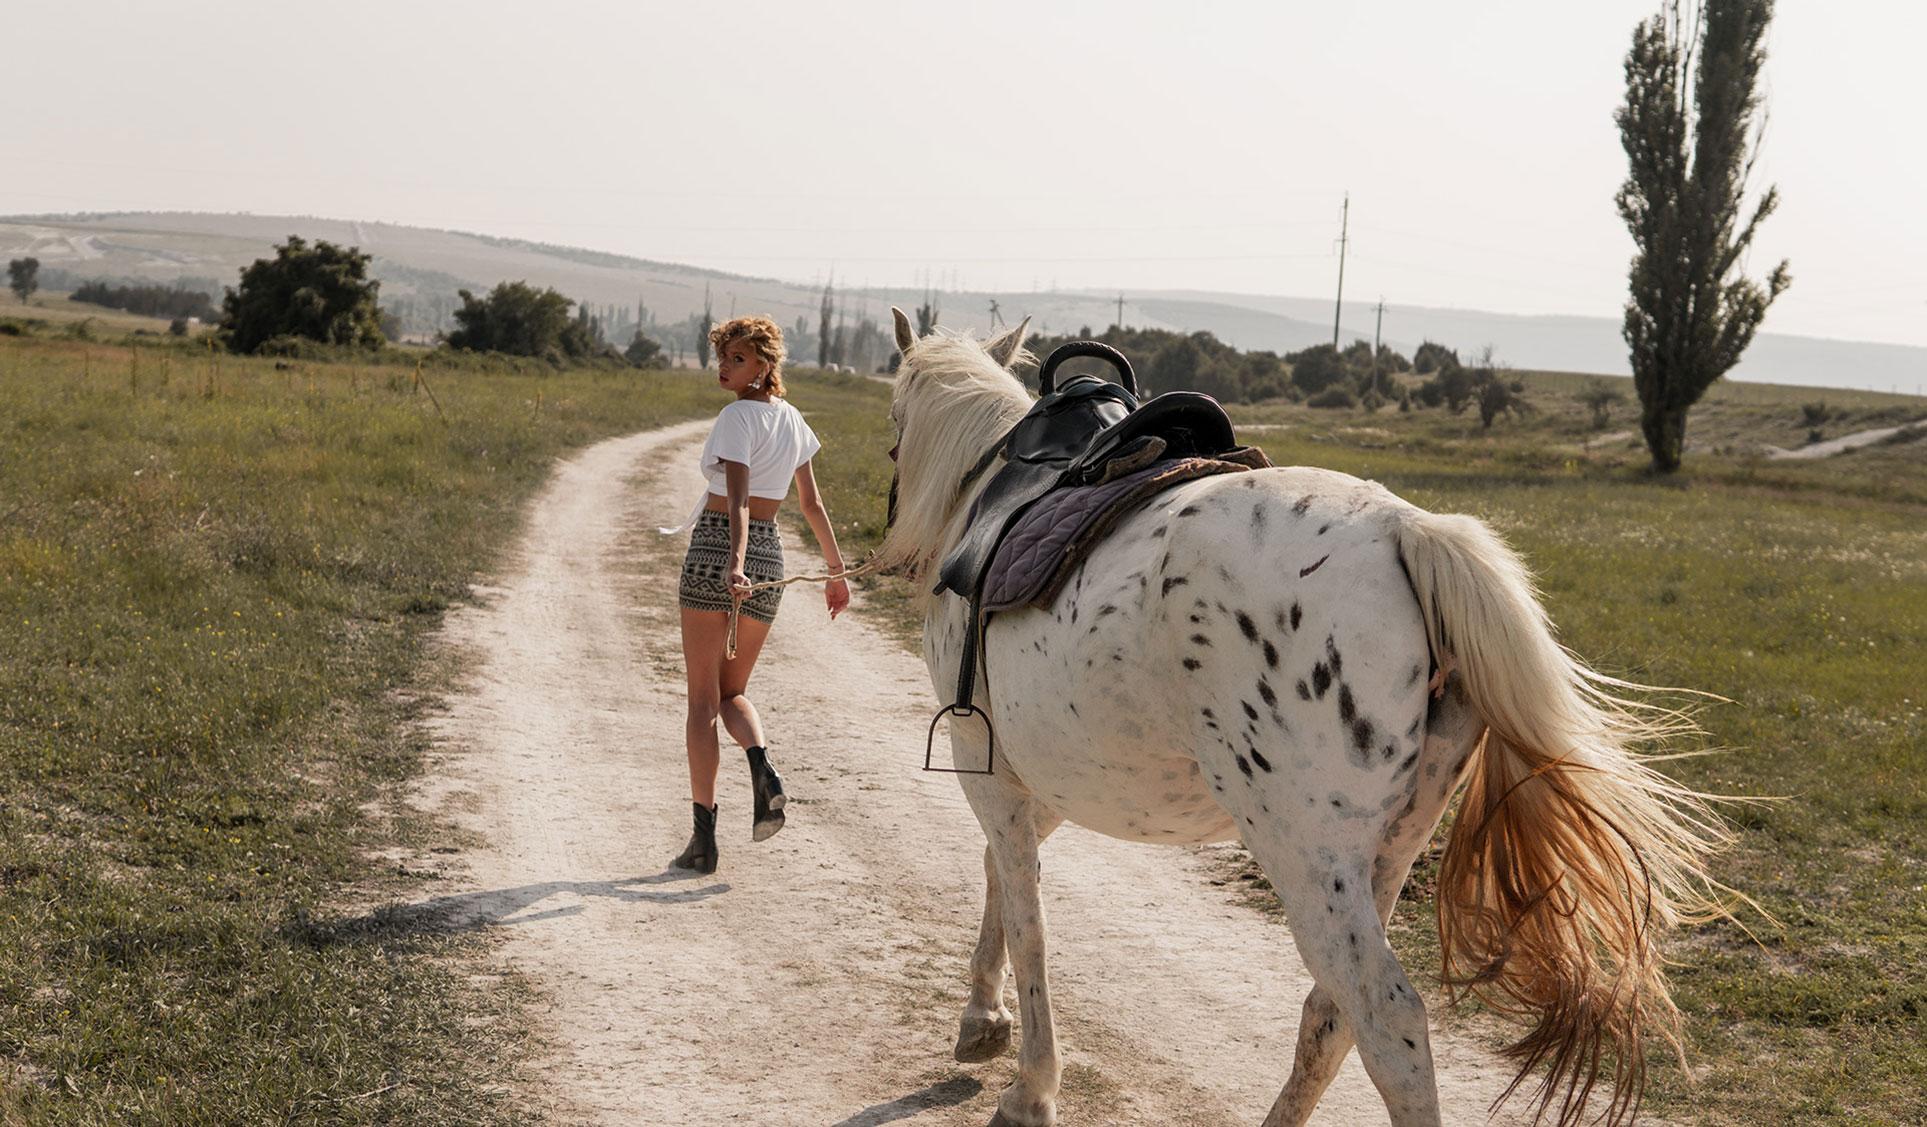 Девушка и лошадь / Даша Степанова в журнале Picton / фото 01